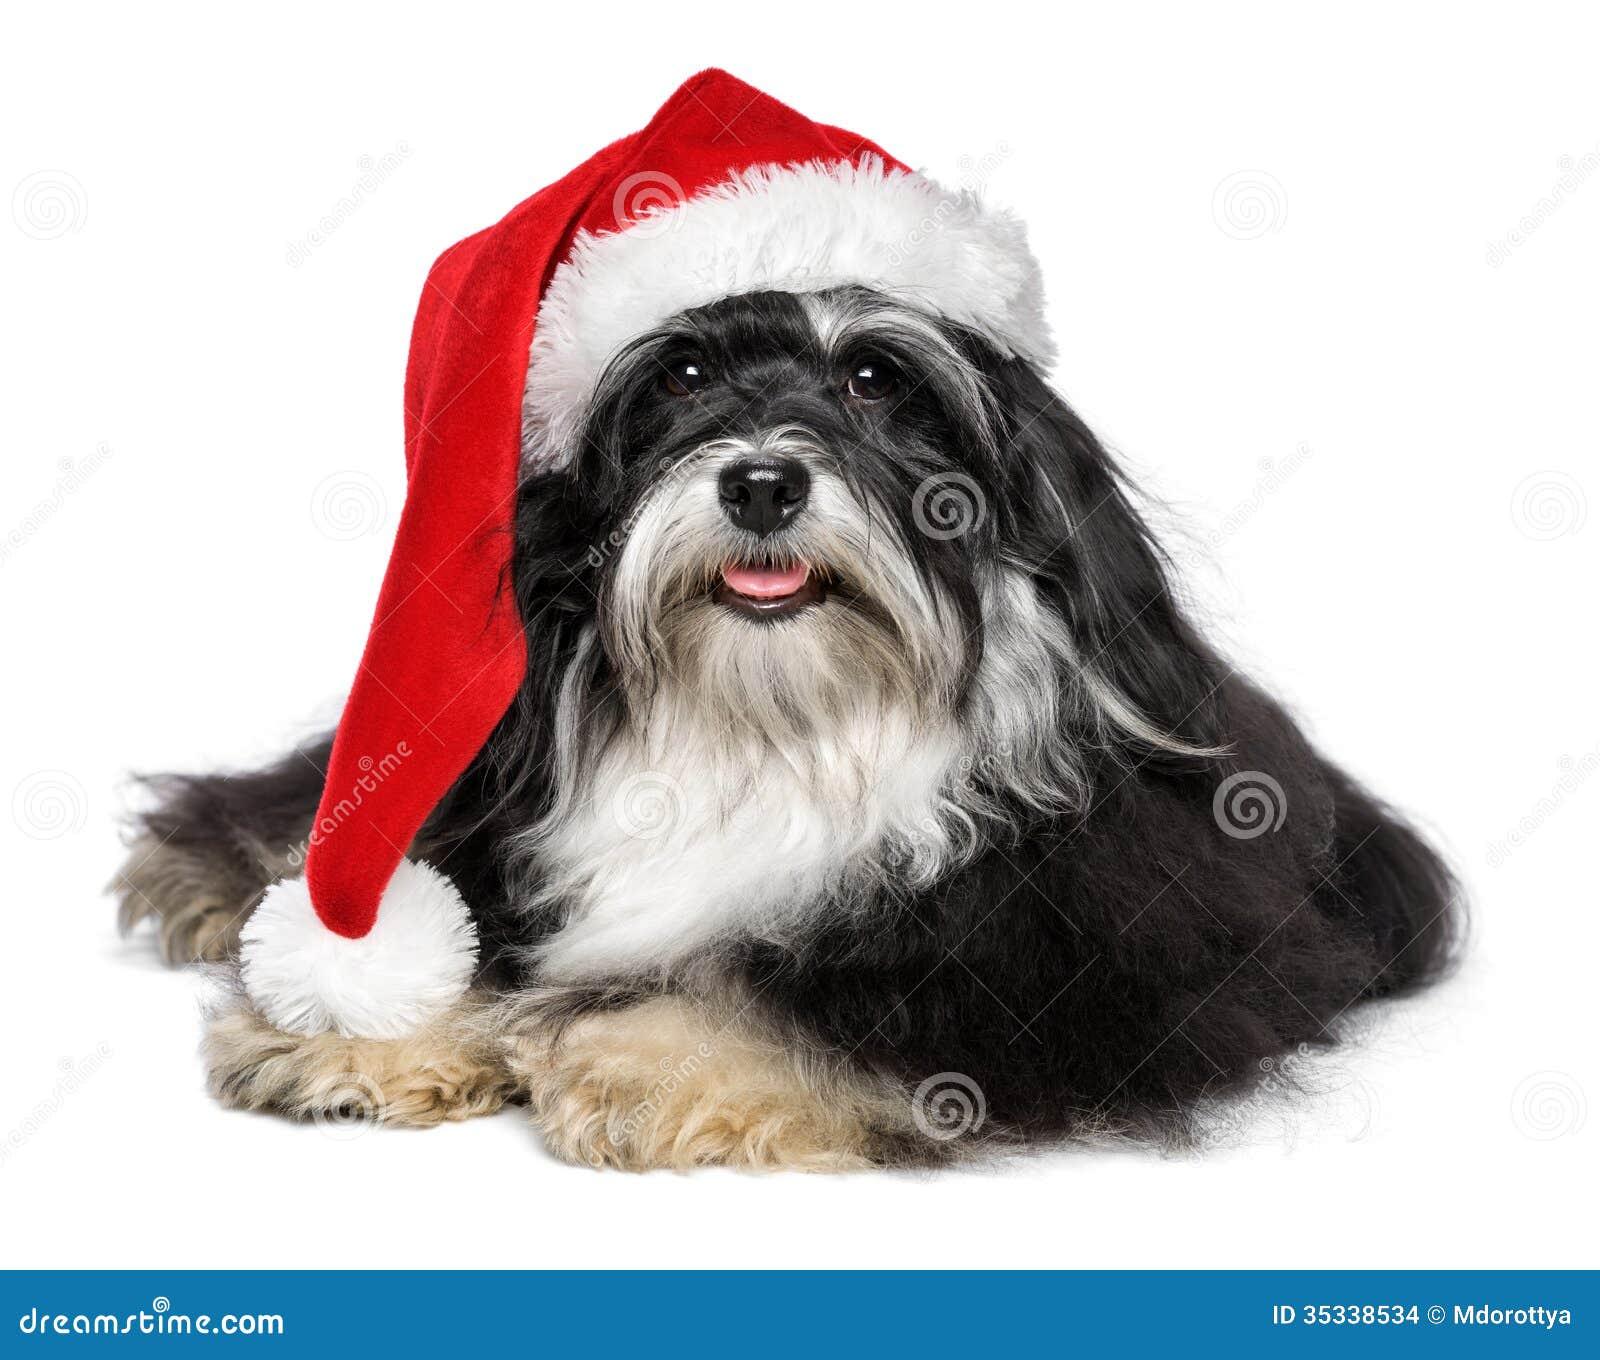 97b7a87a1b1c1 Beautiful Christmas Havanese Dog With Santa Hat And White Beard ...